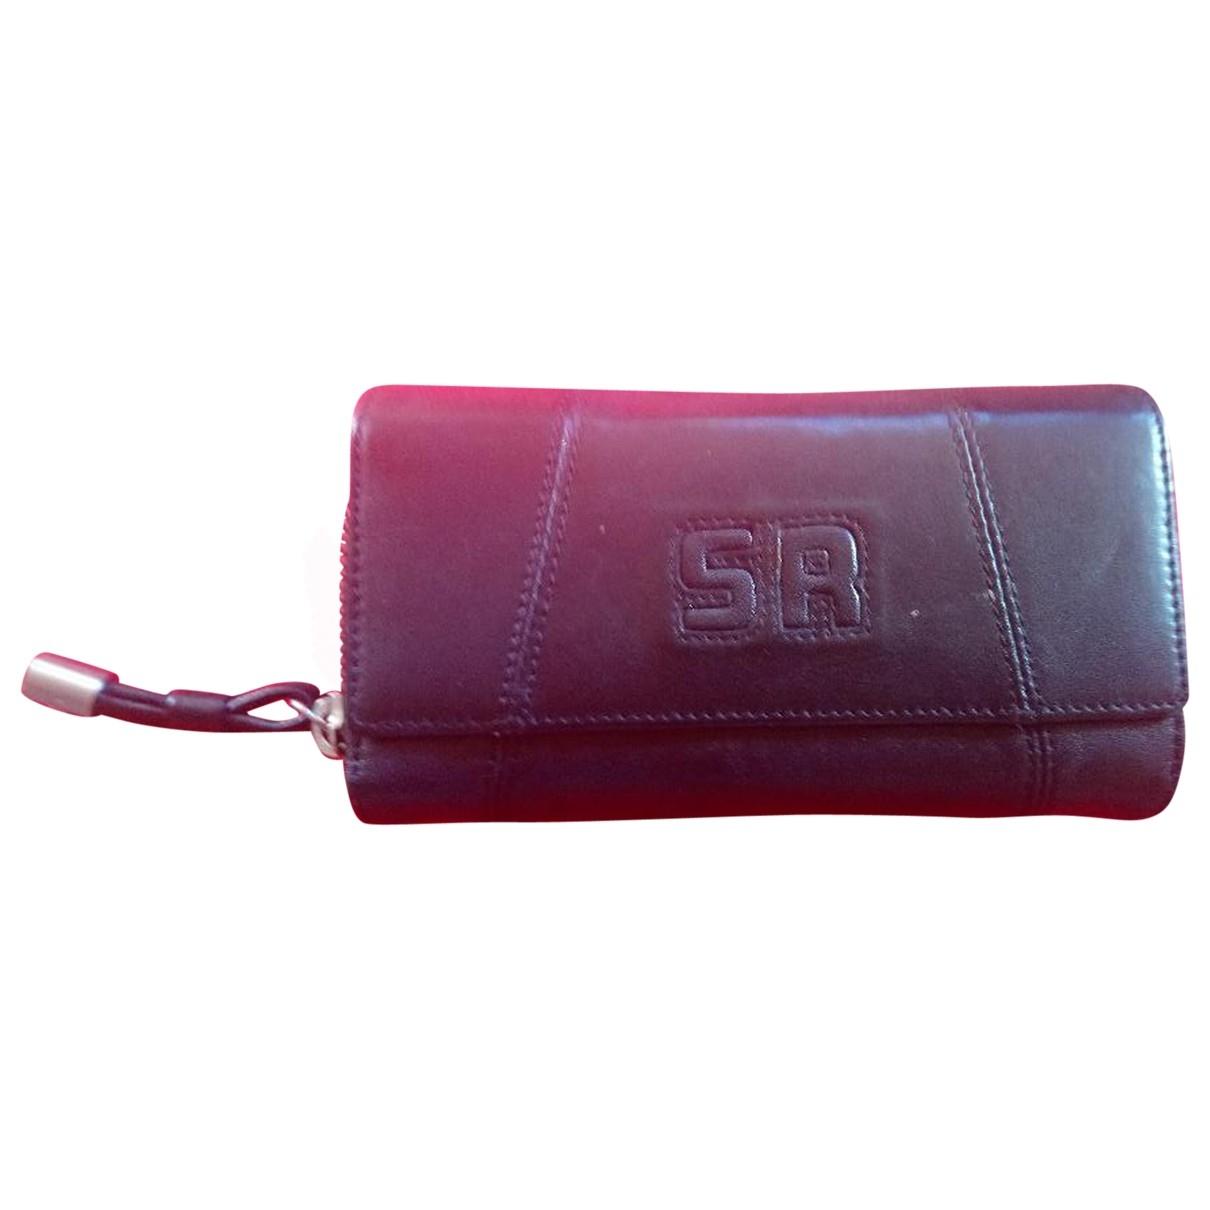 Sonia Rykiel \N Black Leather wallet for Women \N